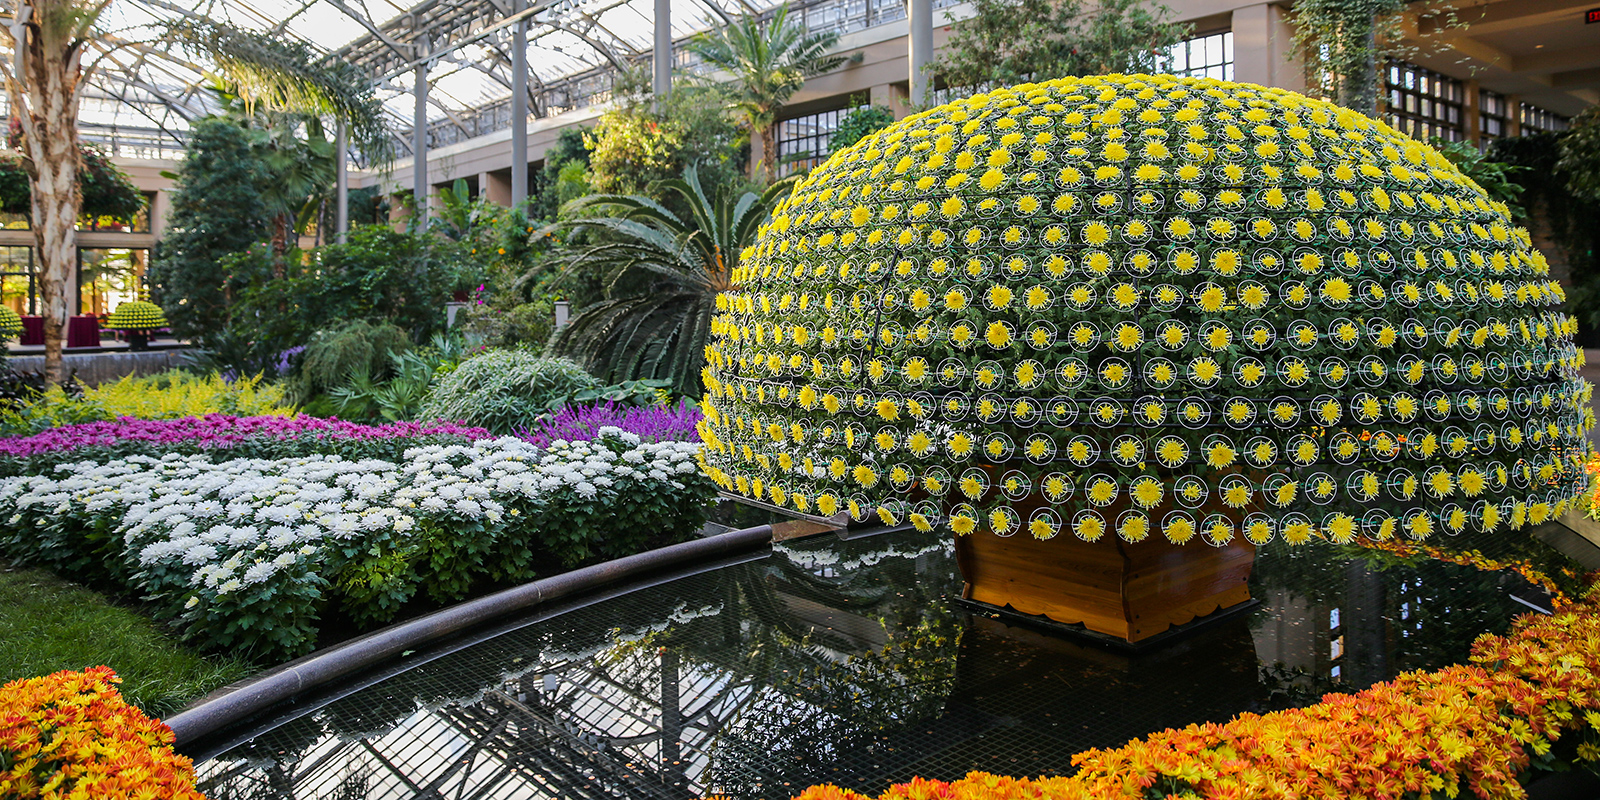 316378_Chrysanthemum-Festival_Mathias_-Becca-_header_1.jpg